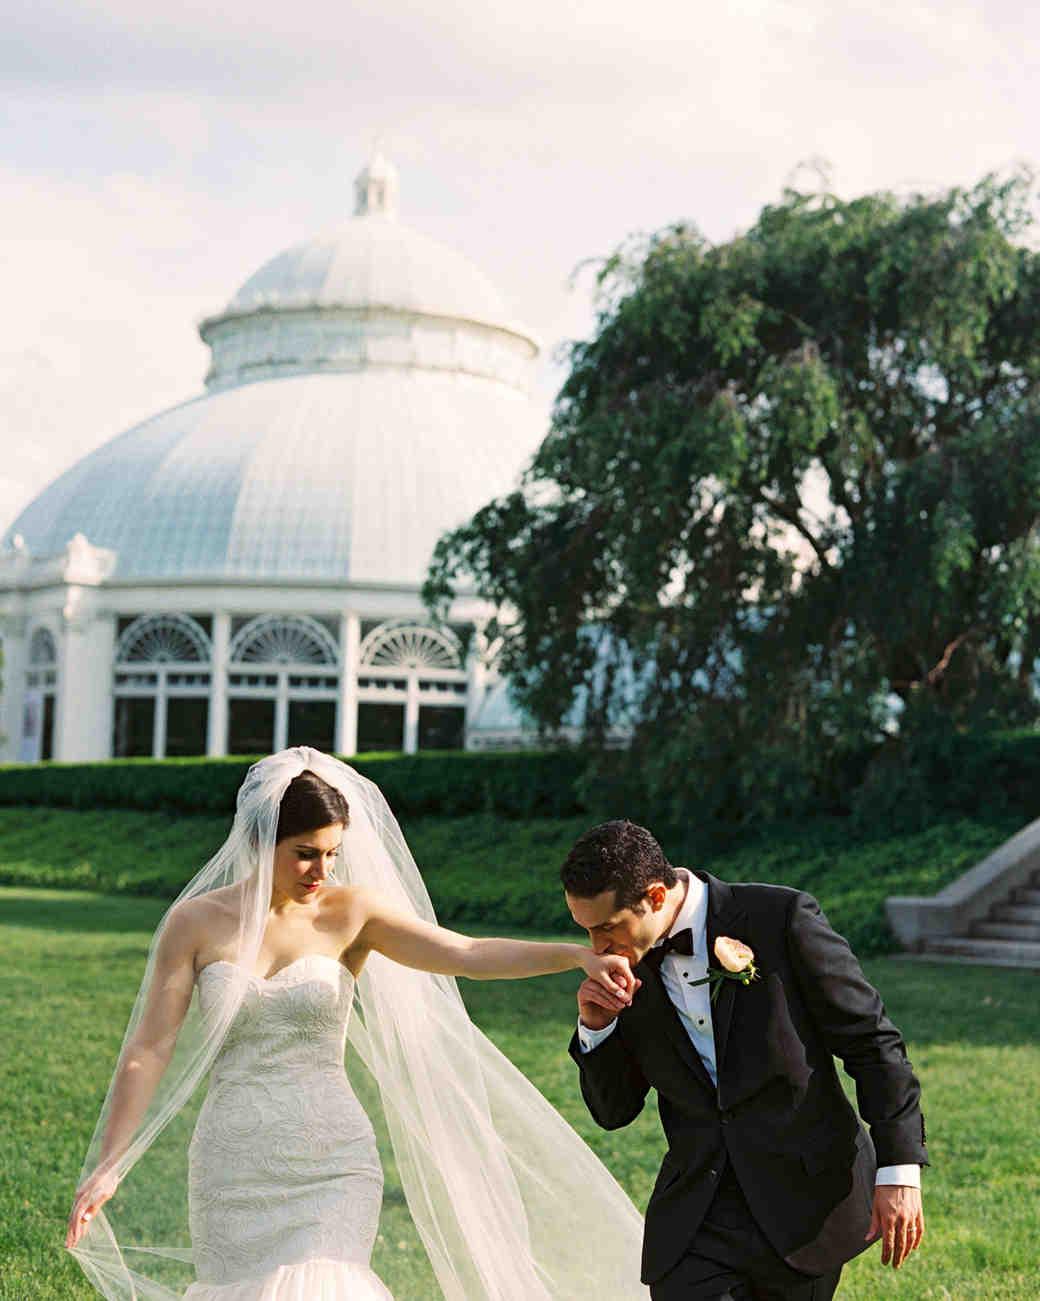 jess-levin-wedding-venue-tips-8-0316.jpg